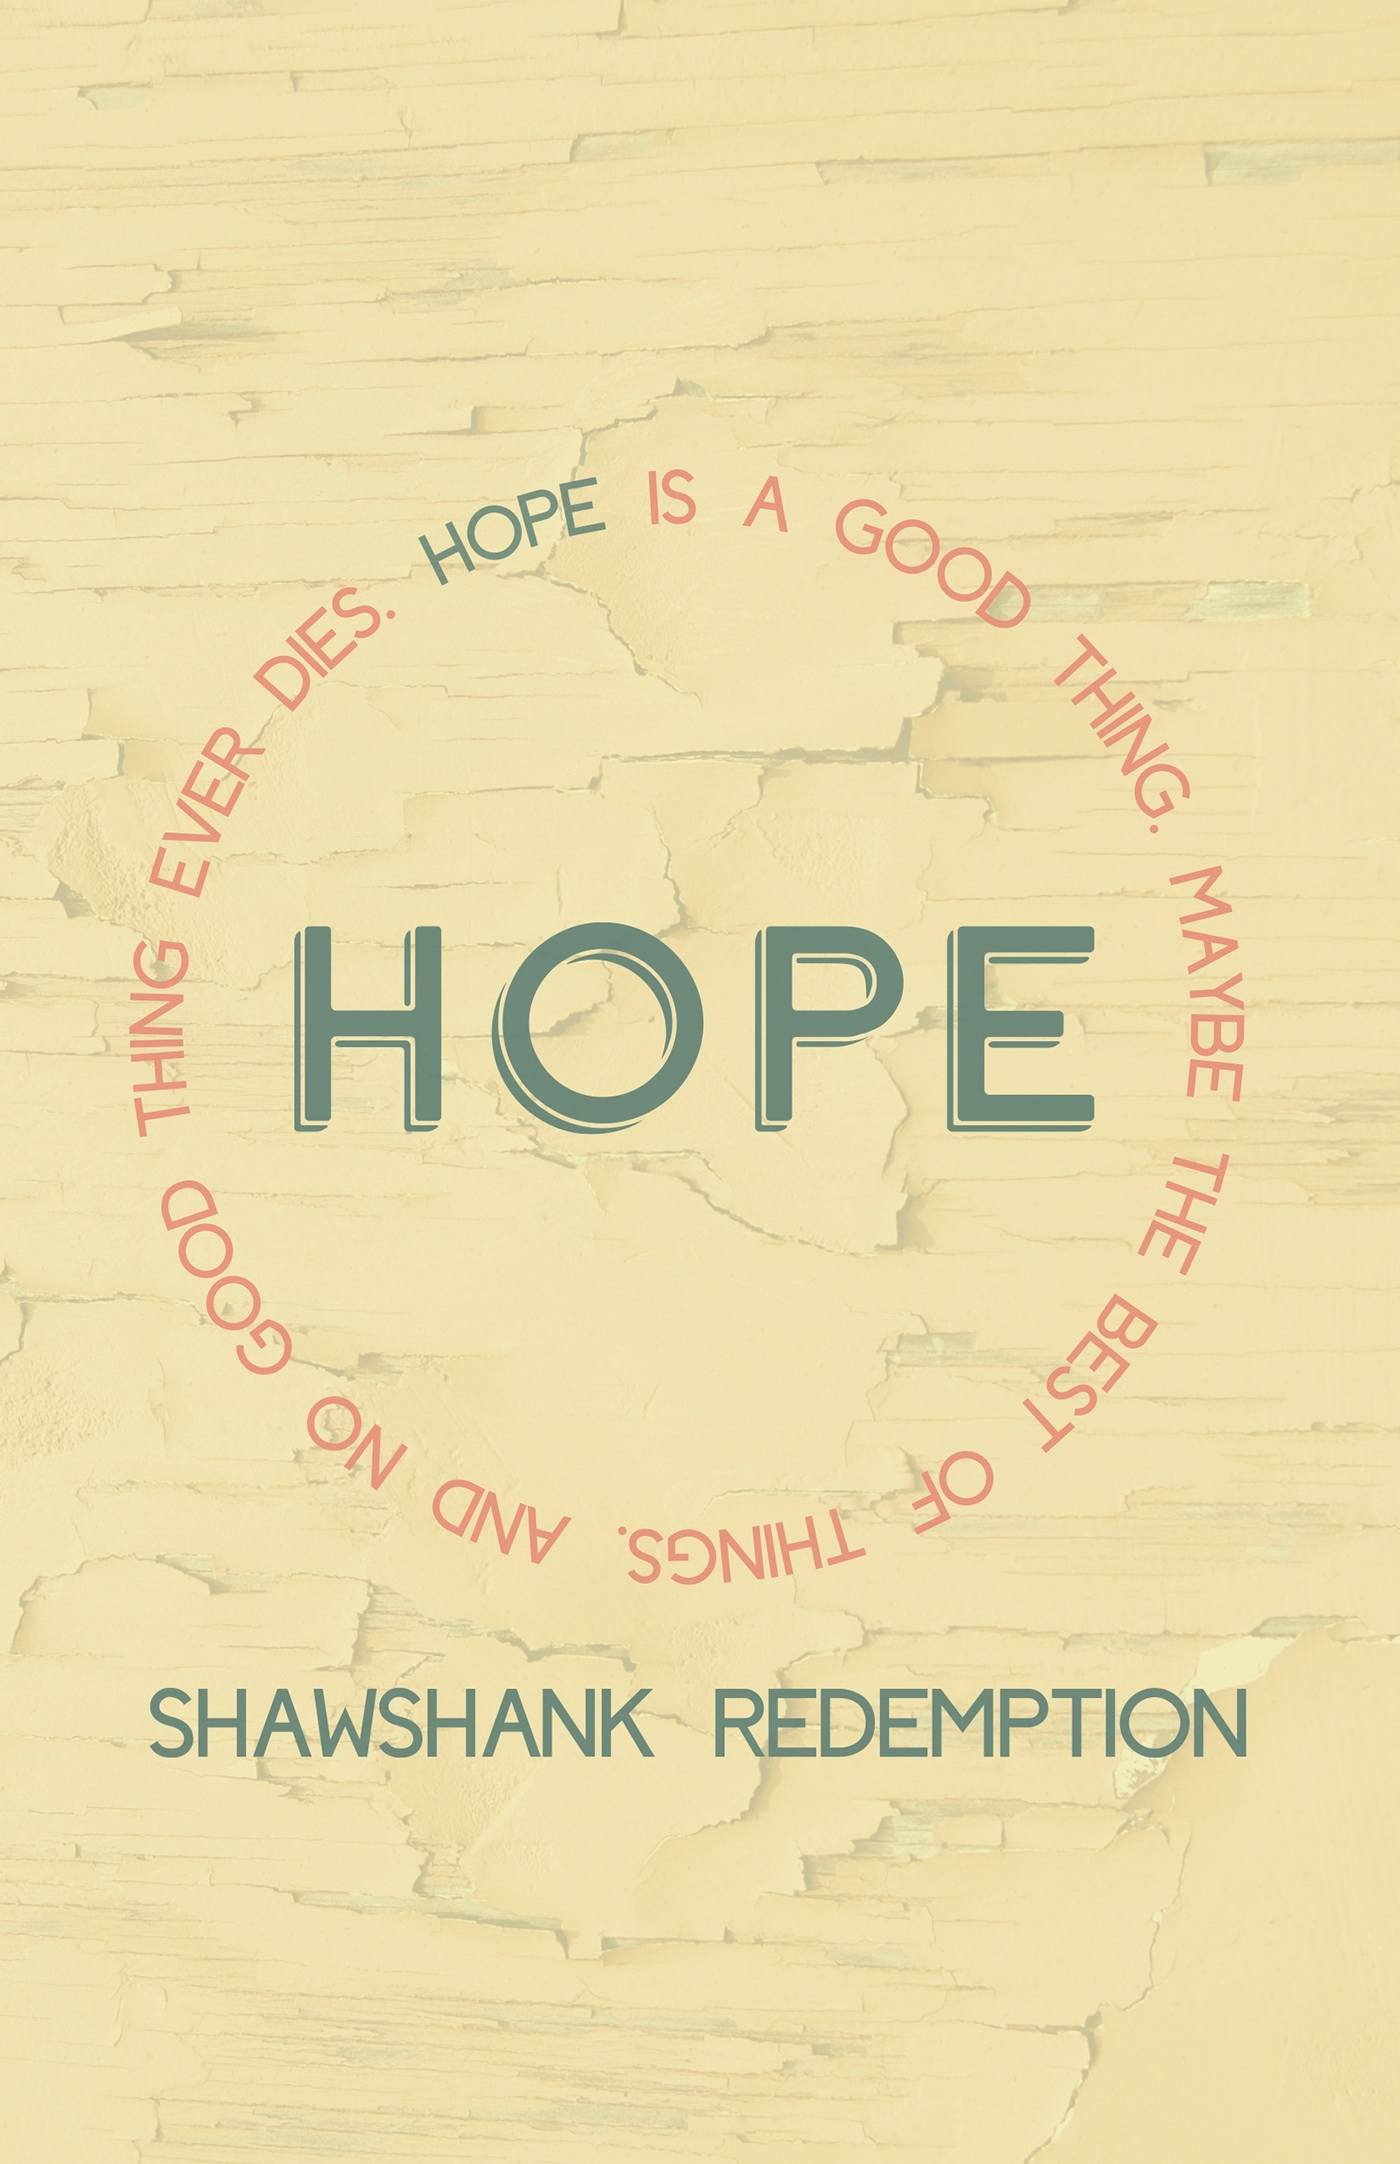 personal response on shawshank redemption Rita hayworth and shawshank redemption vocab wordss personal response on shawshank redemption shawshank and raw.